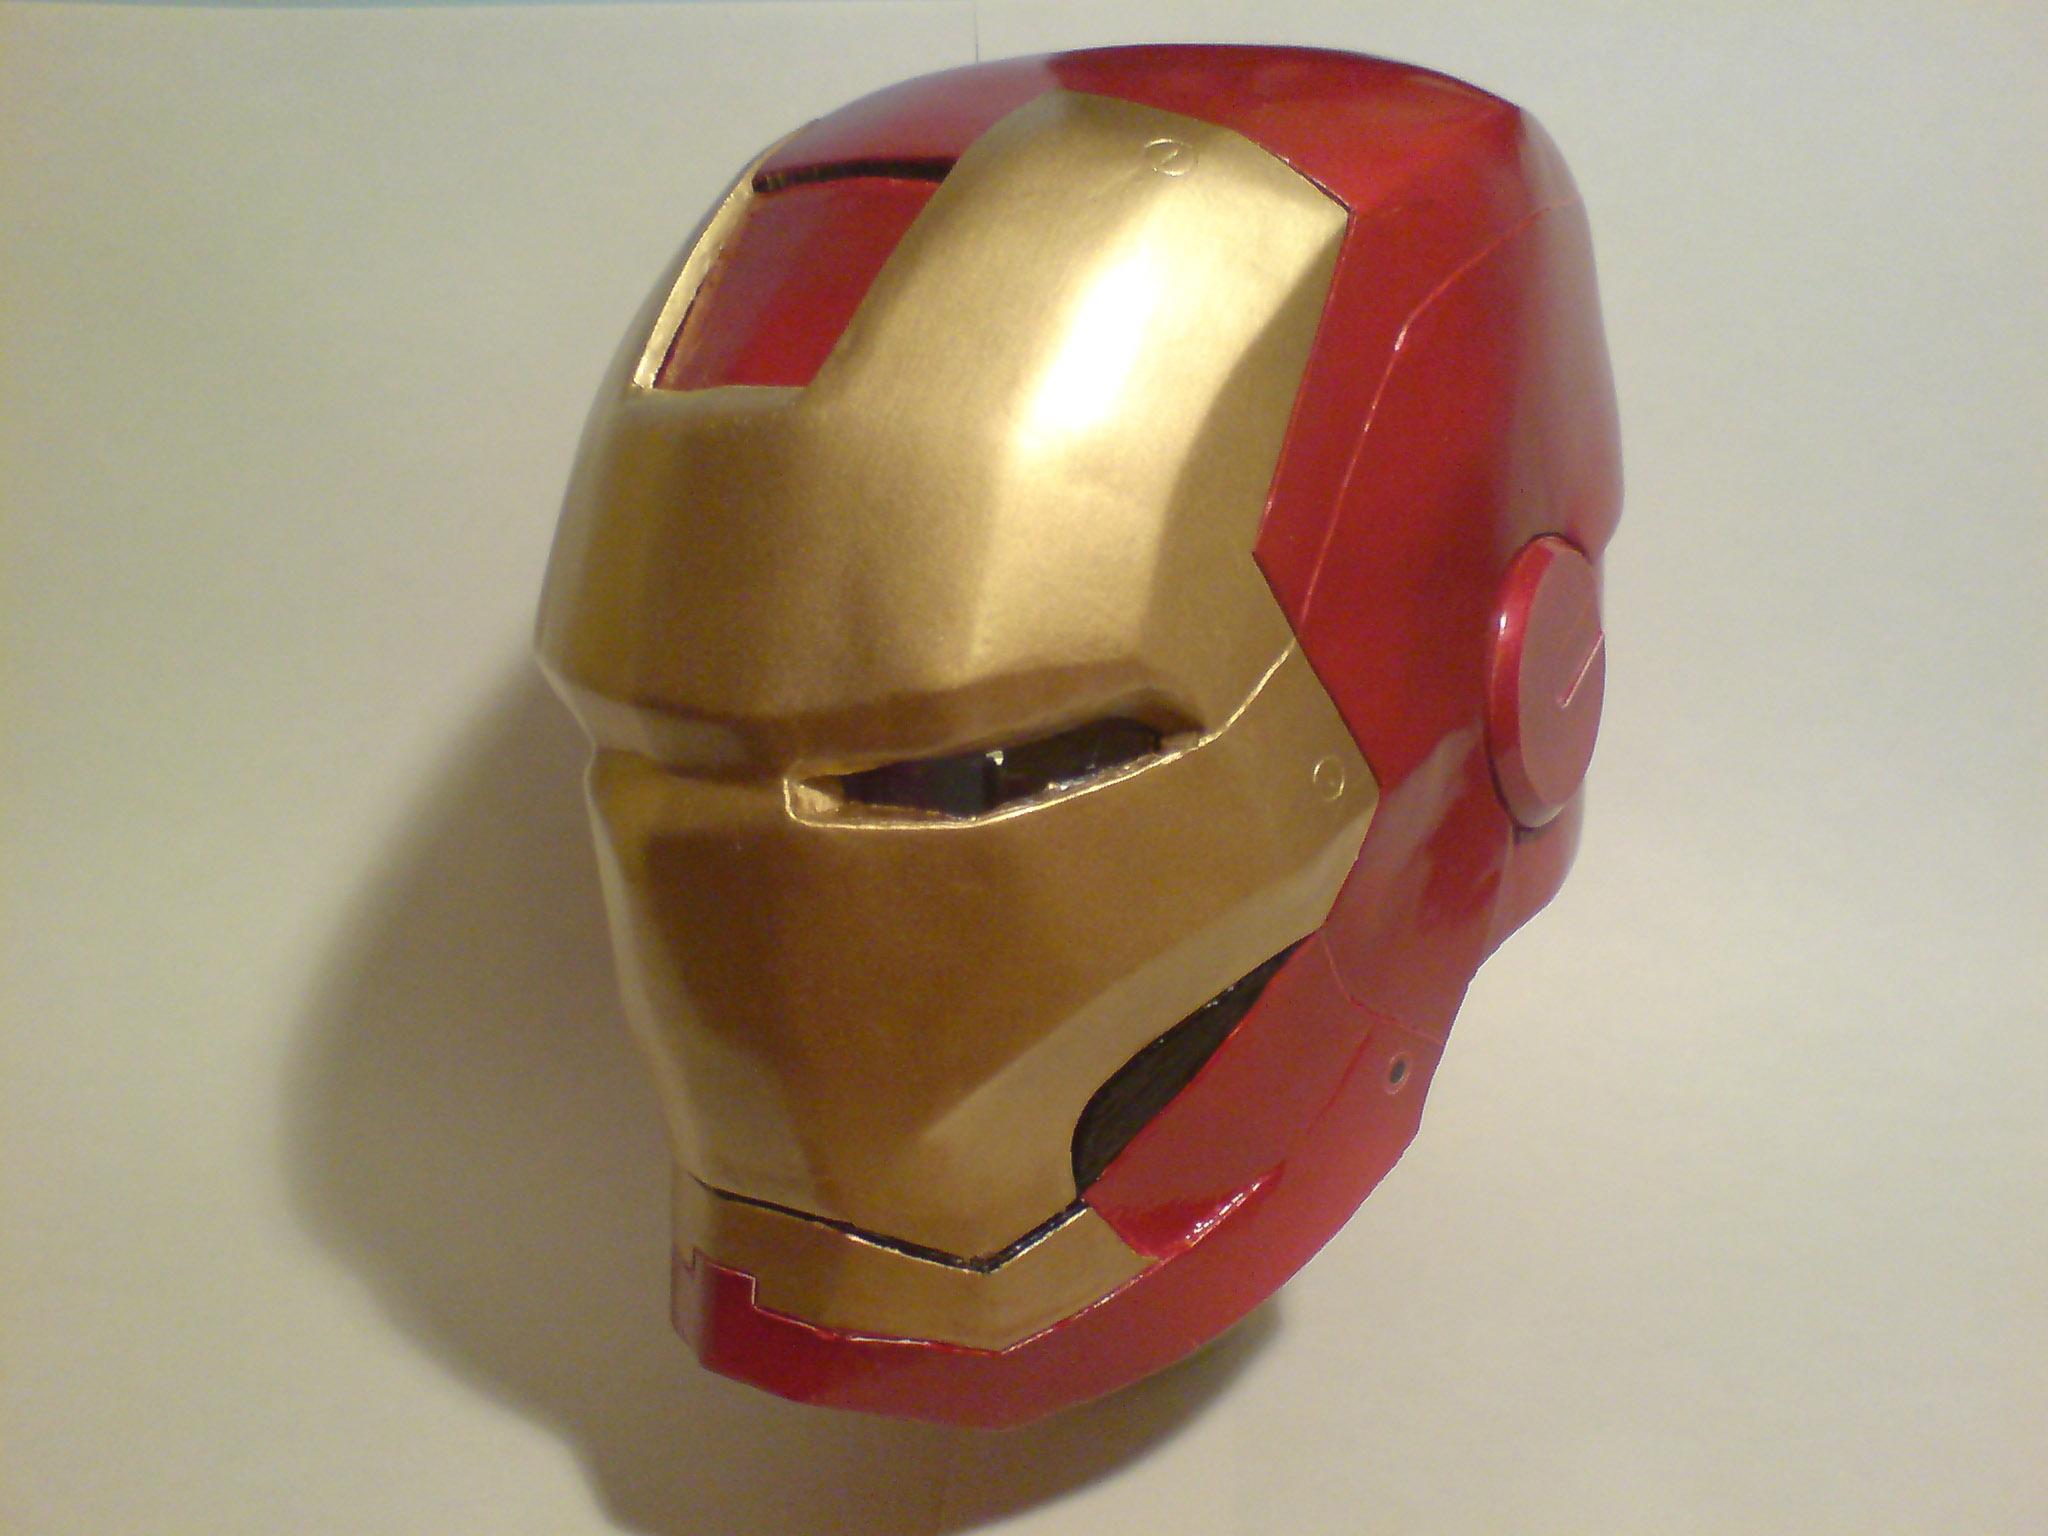 Iron Man 2008 helmet